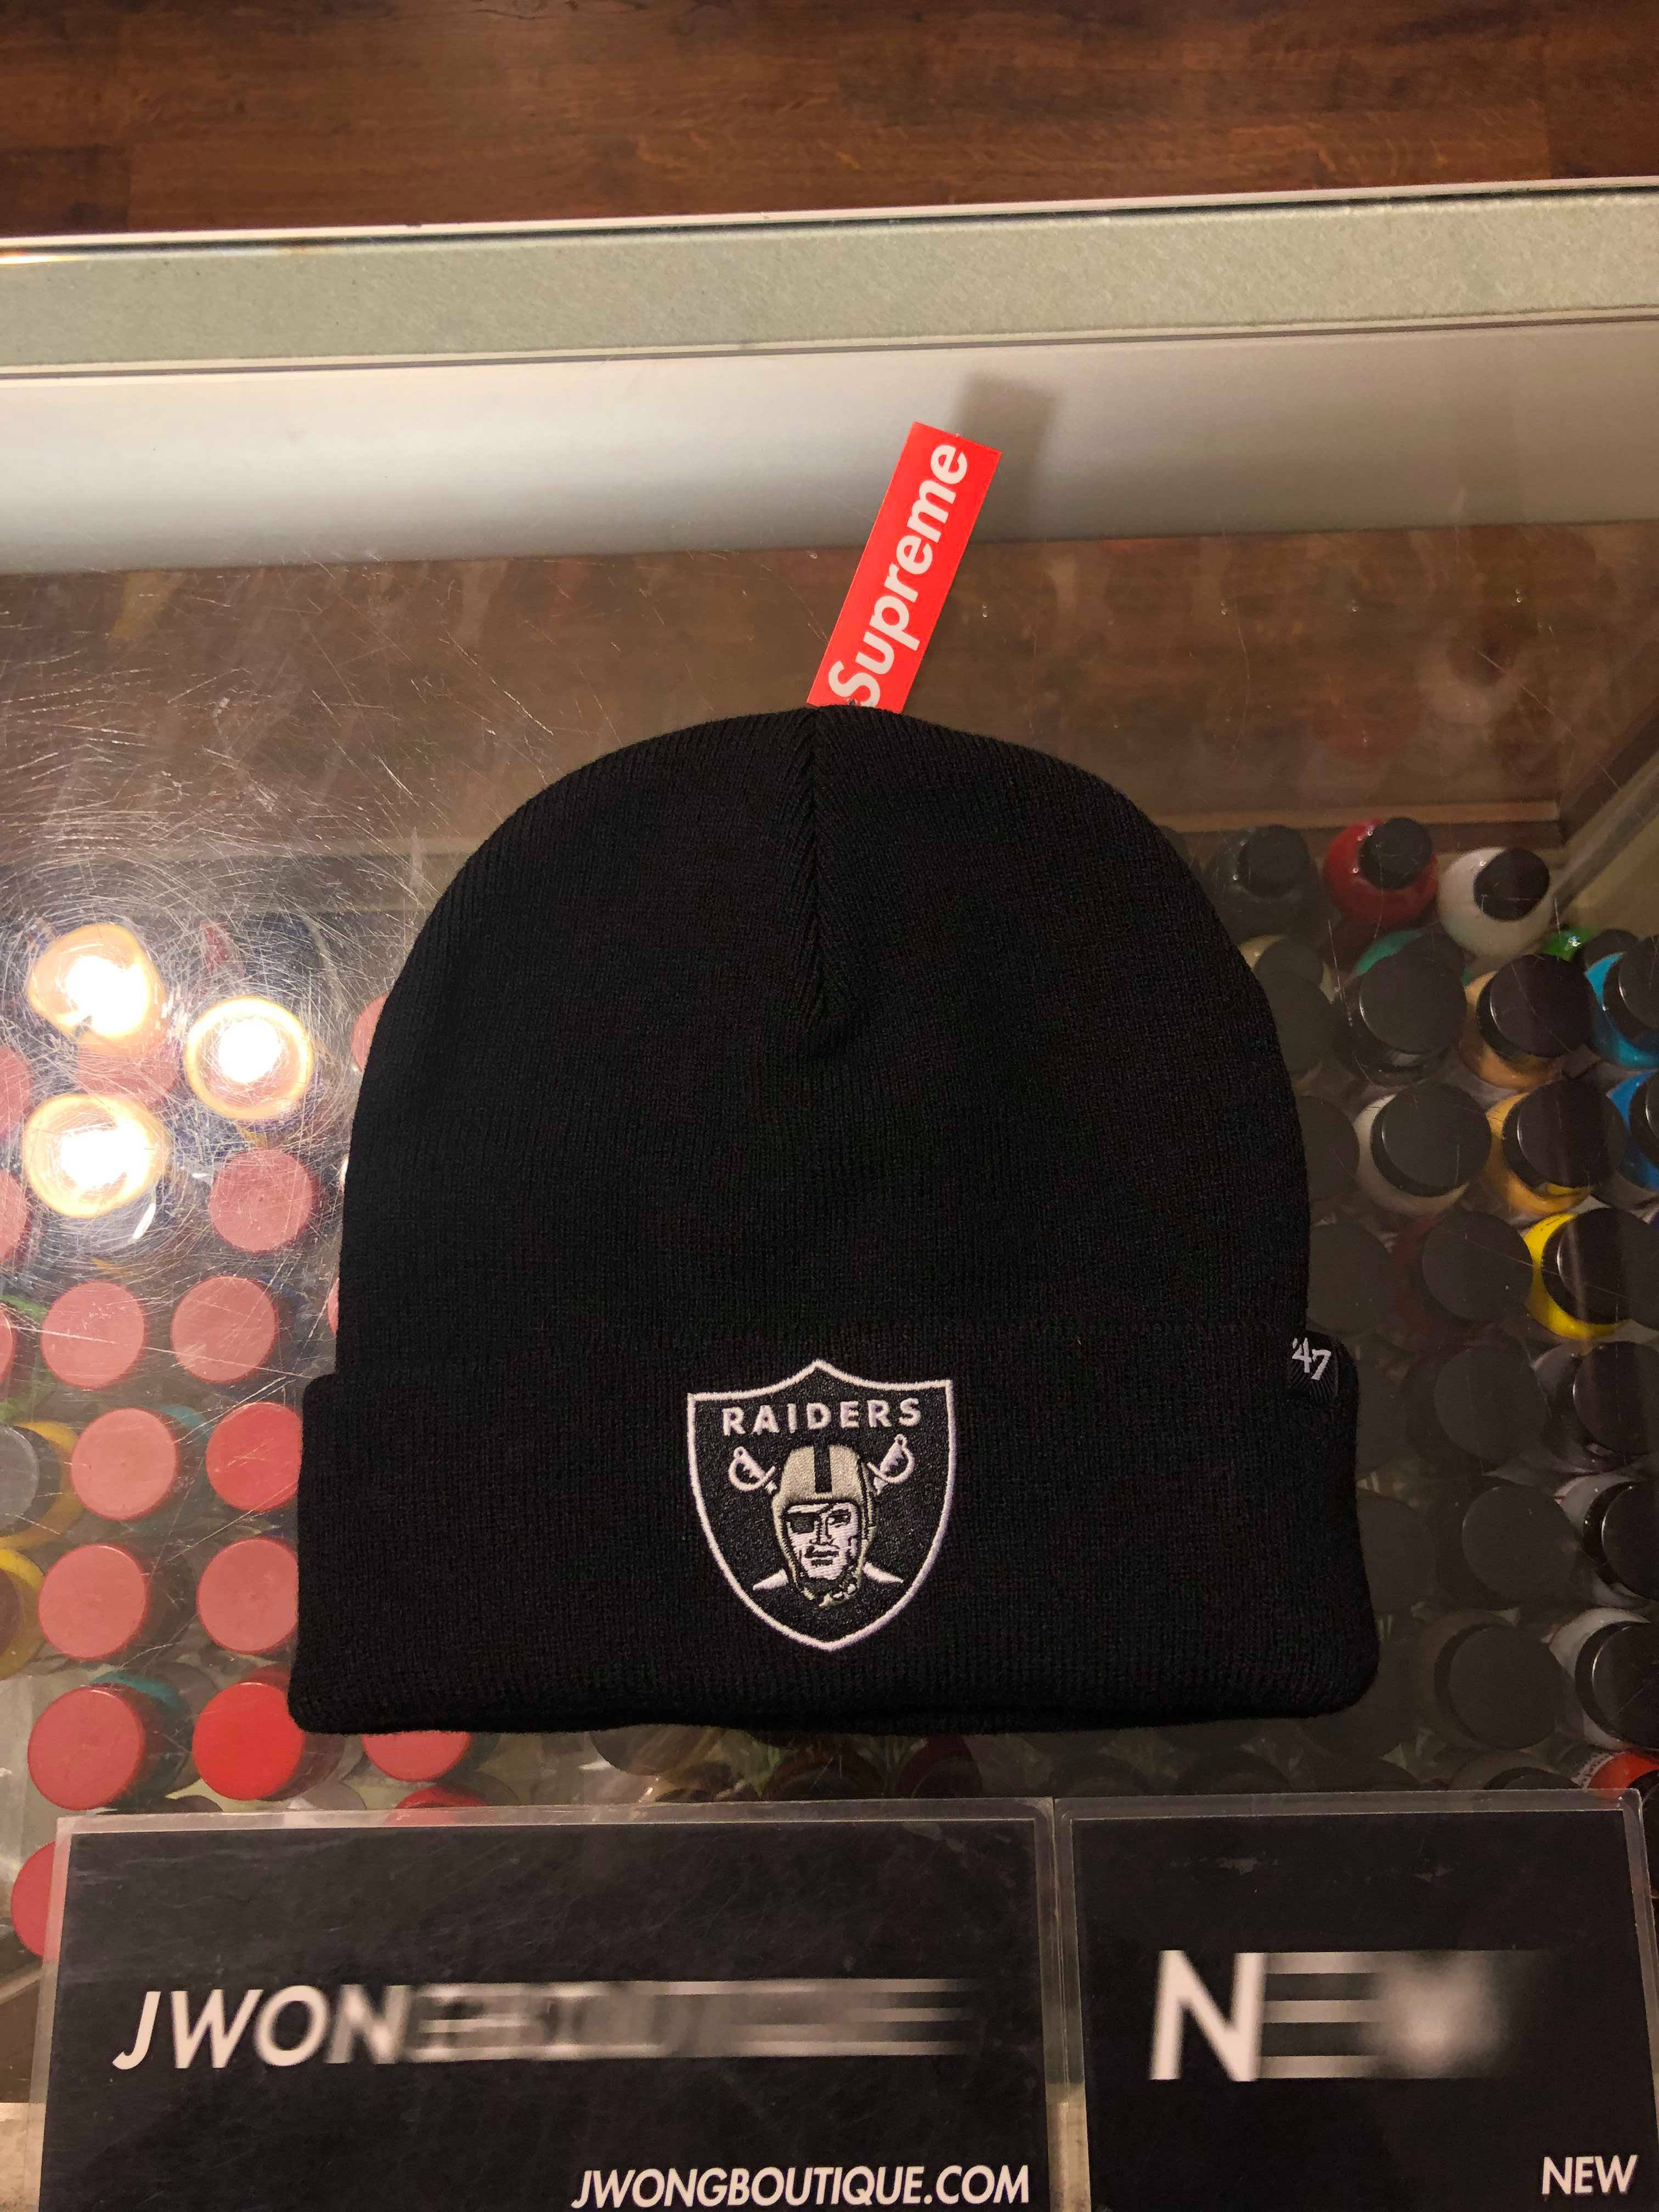 192e40cc8 2019 2019 Supreme NFL x Raiders x 47 Beanie Black